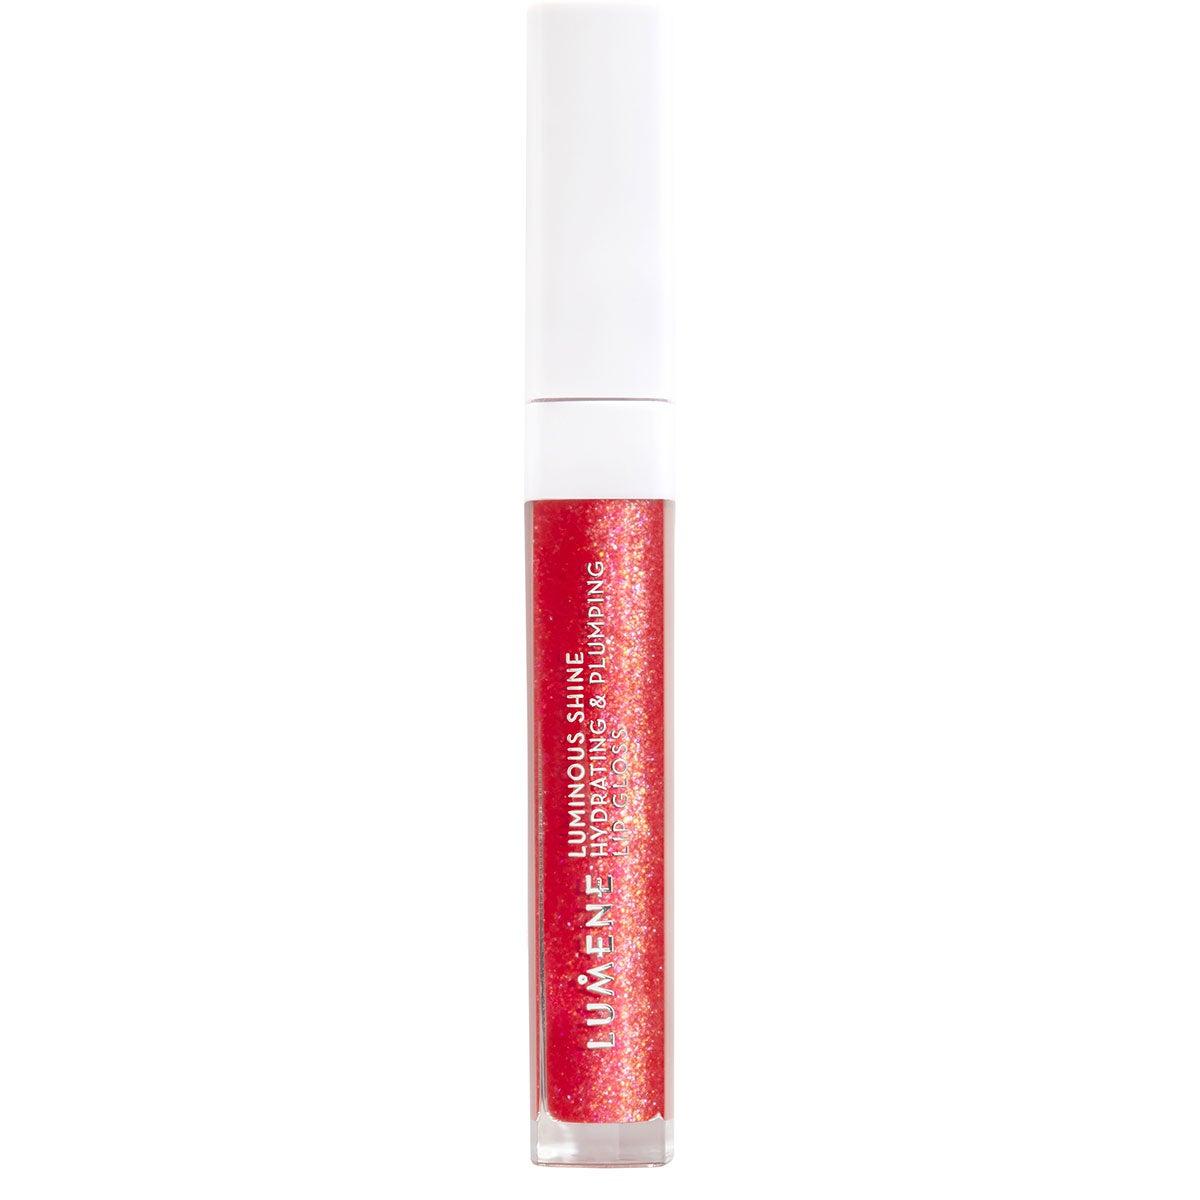 Luminous Shine Hydrating & Plumping Lip Gloss Lumene Läppglans